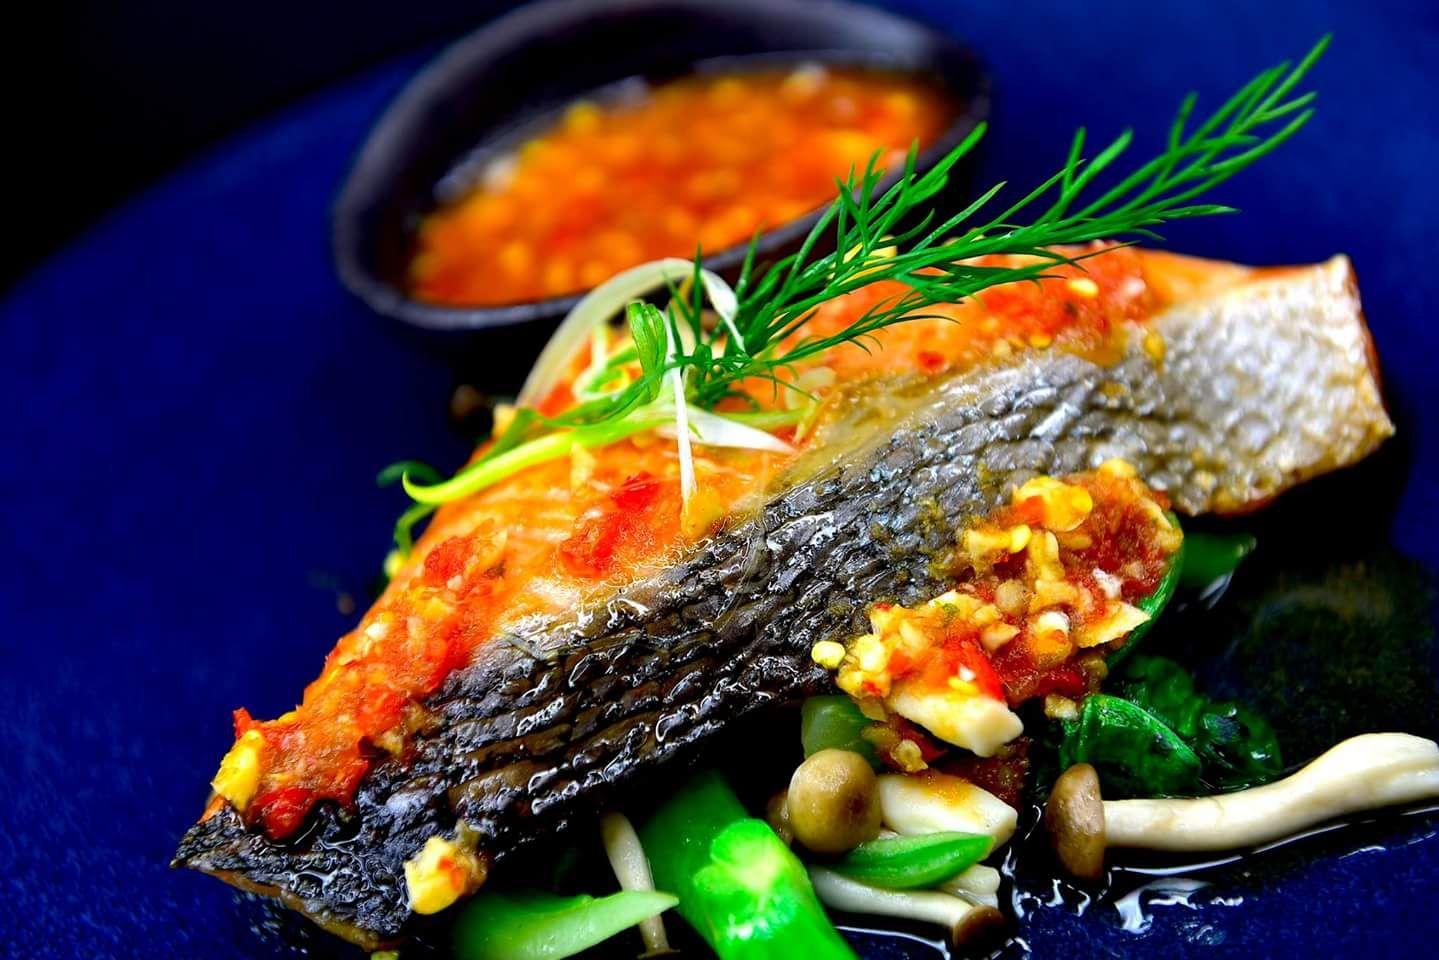 Silken salmon in chili lime jus at Namo.